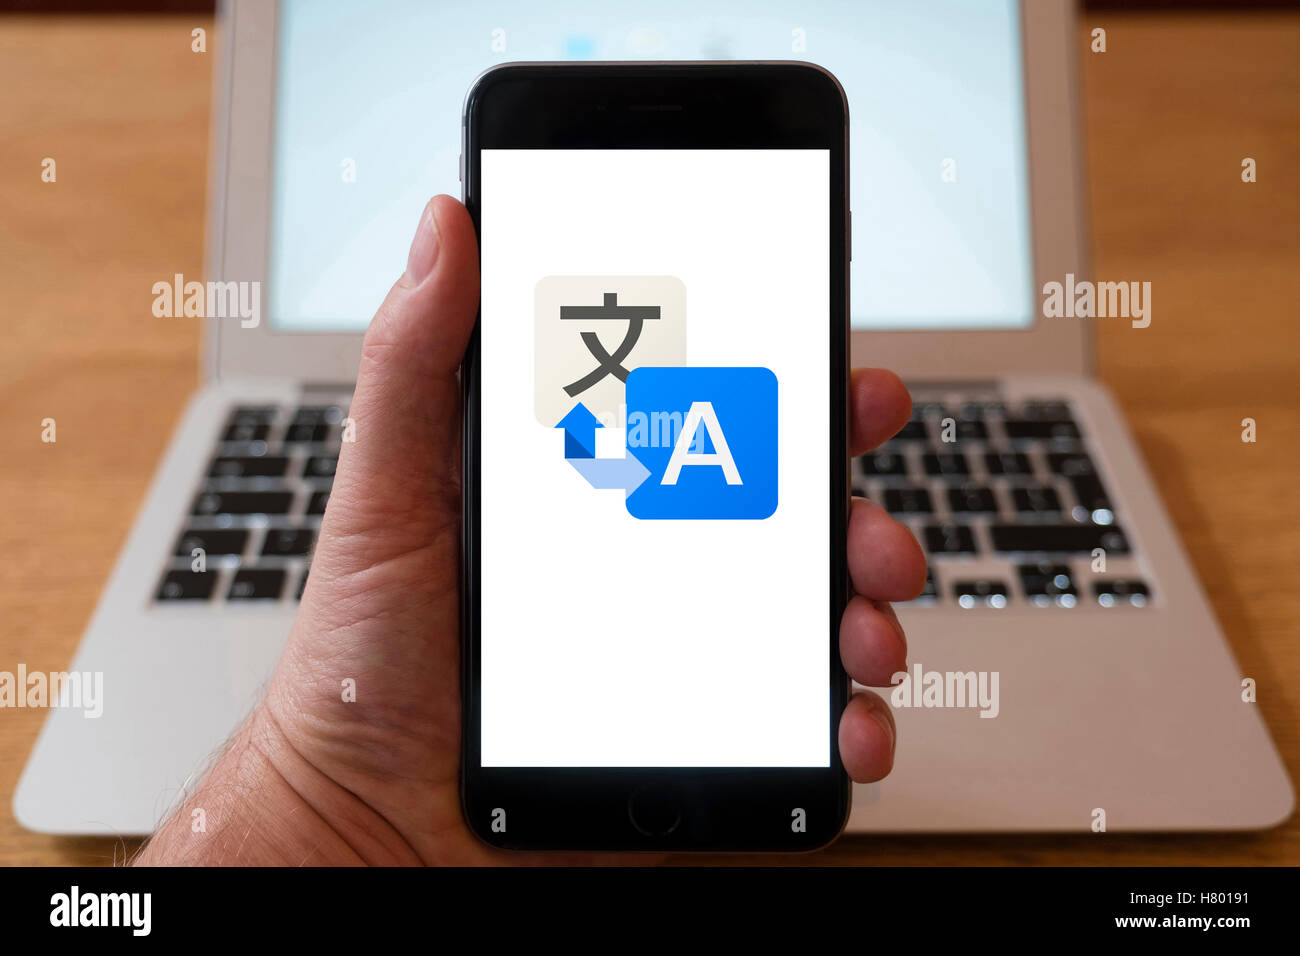 Using iPhone smartphone to display logo of Google Translate online translation service - Stock Image